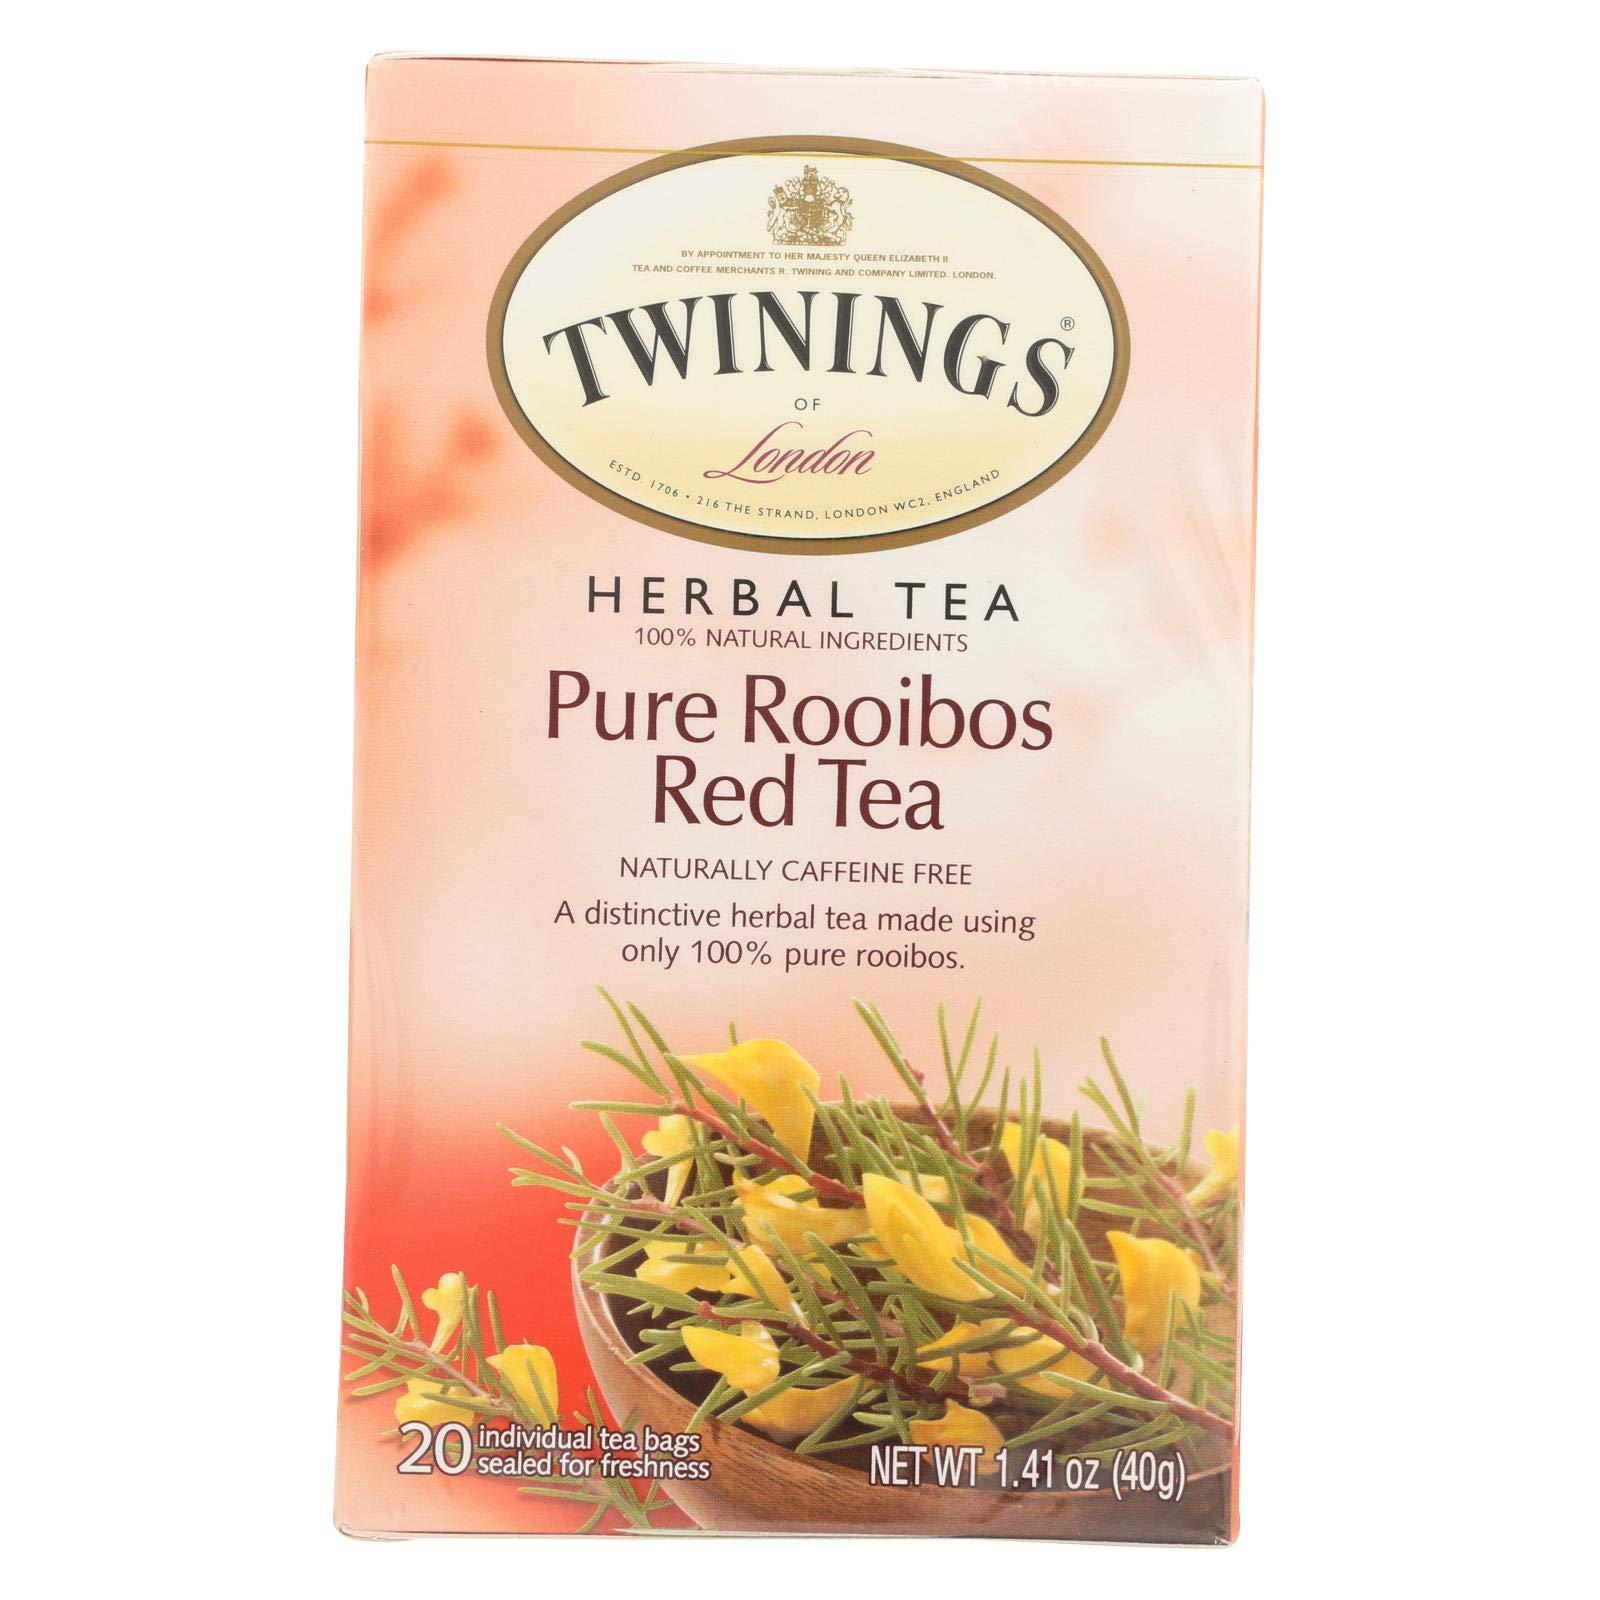 Twinings of London African Rooibos Red Tea (Pack Of 120)